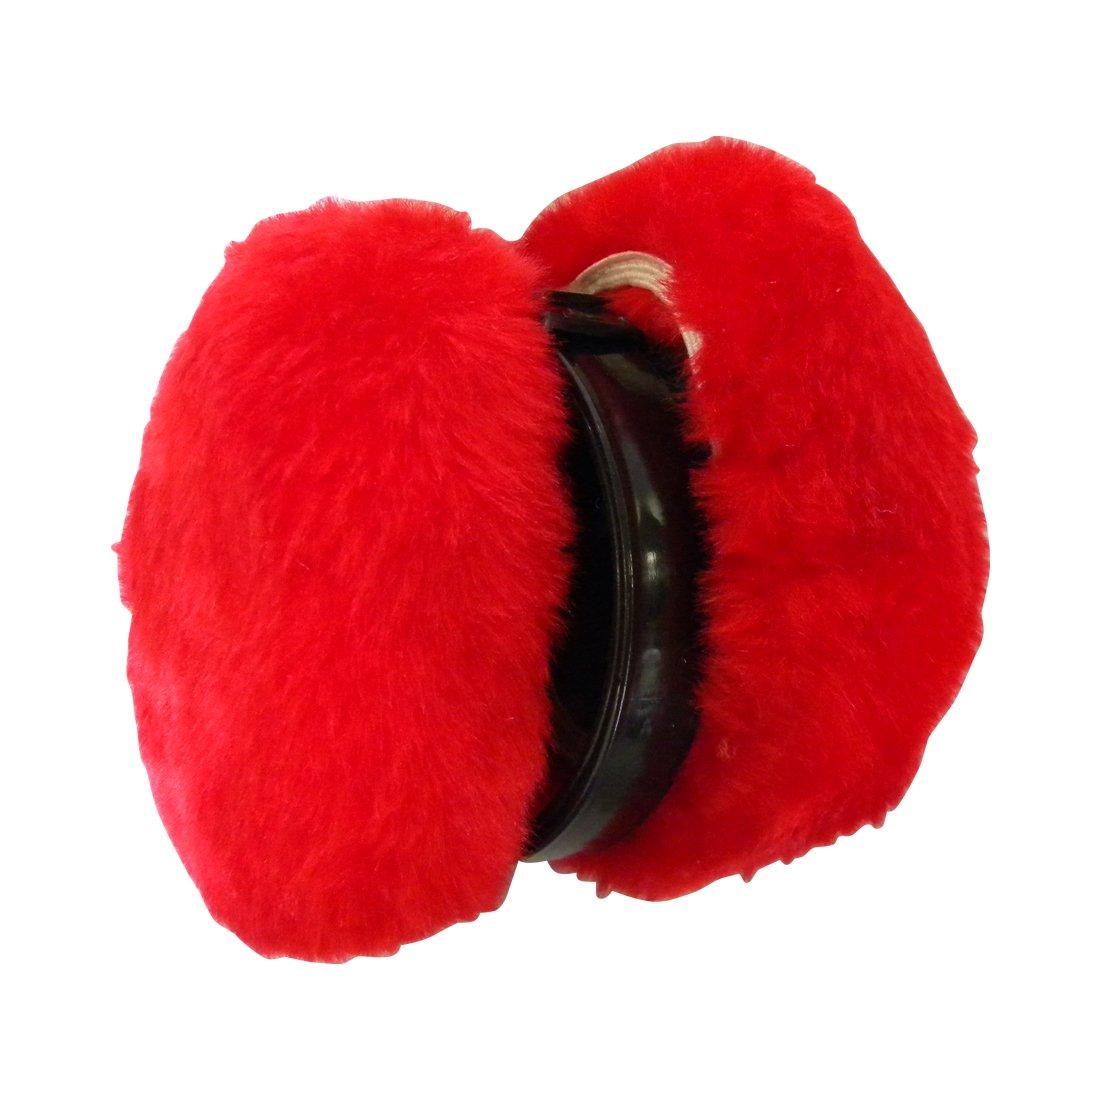 Solid Colors Ear Muffs Folding Earmuffs Ear Warmers em-reg-solid-black